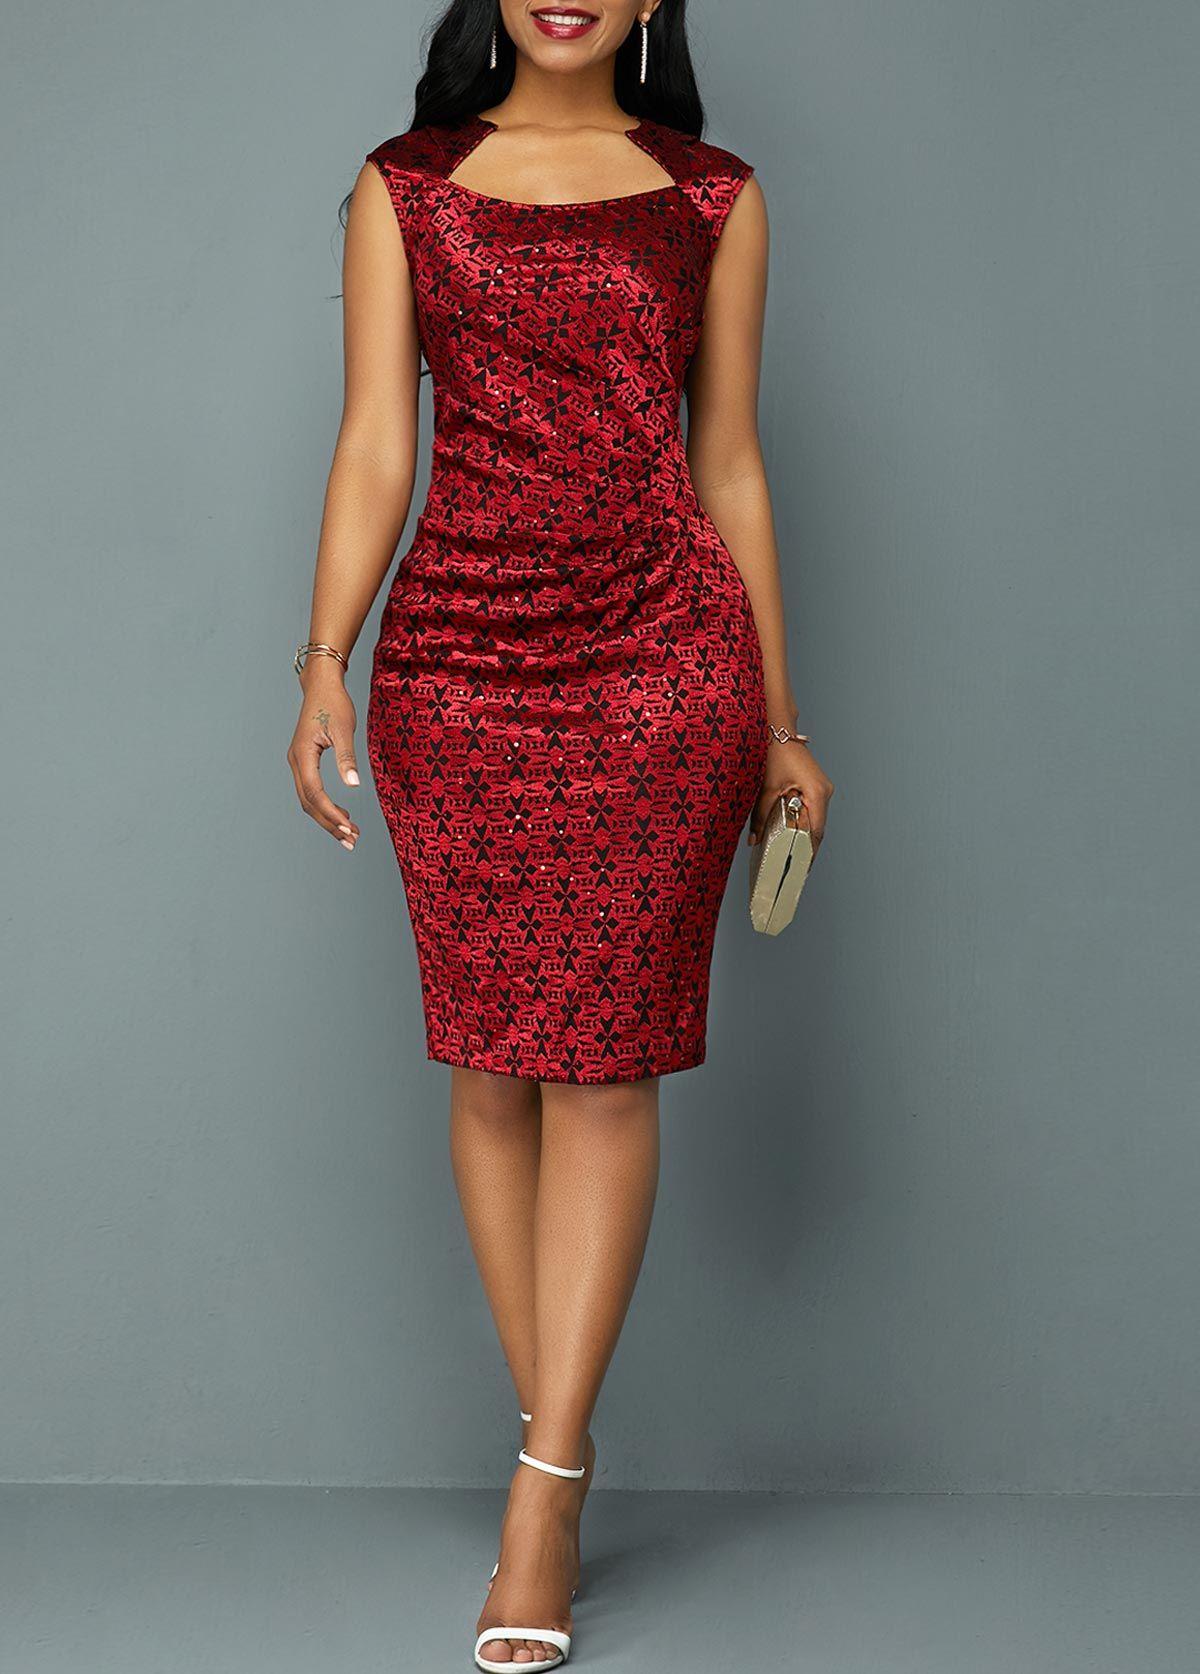 Wine Red Sleeveless Ruched Sheath Dress Rotita Com Usd 30 32 Red Sheath Dress Lace Blue Dress Fashion Dresses Online [ 1674 x 1200 Pixel ]